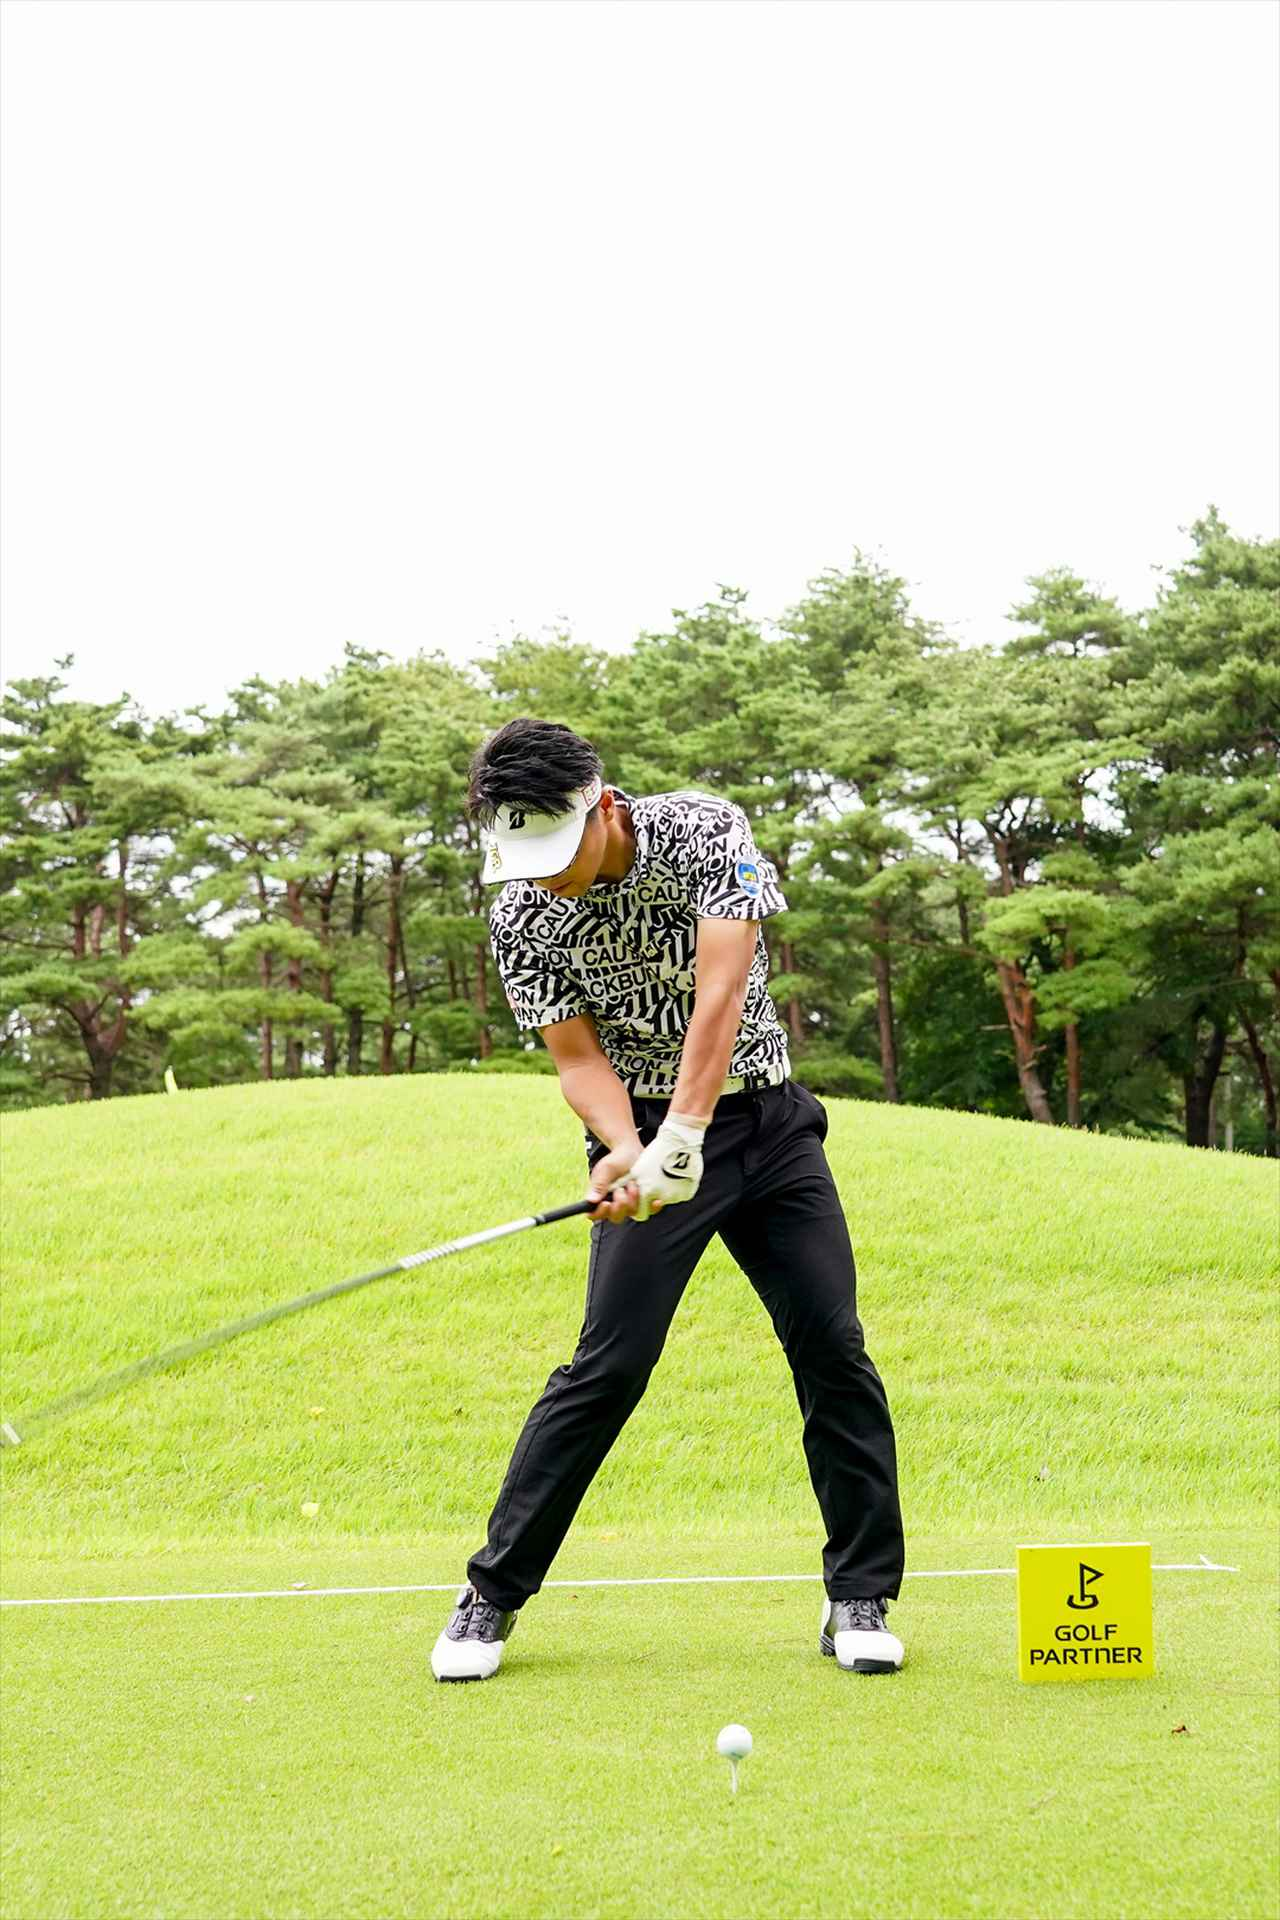 Images : 7番目の画像 - 関藤直煕 ドライバー正面連続写真 - みんなのゴルフダイジェスト